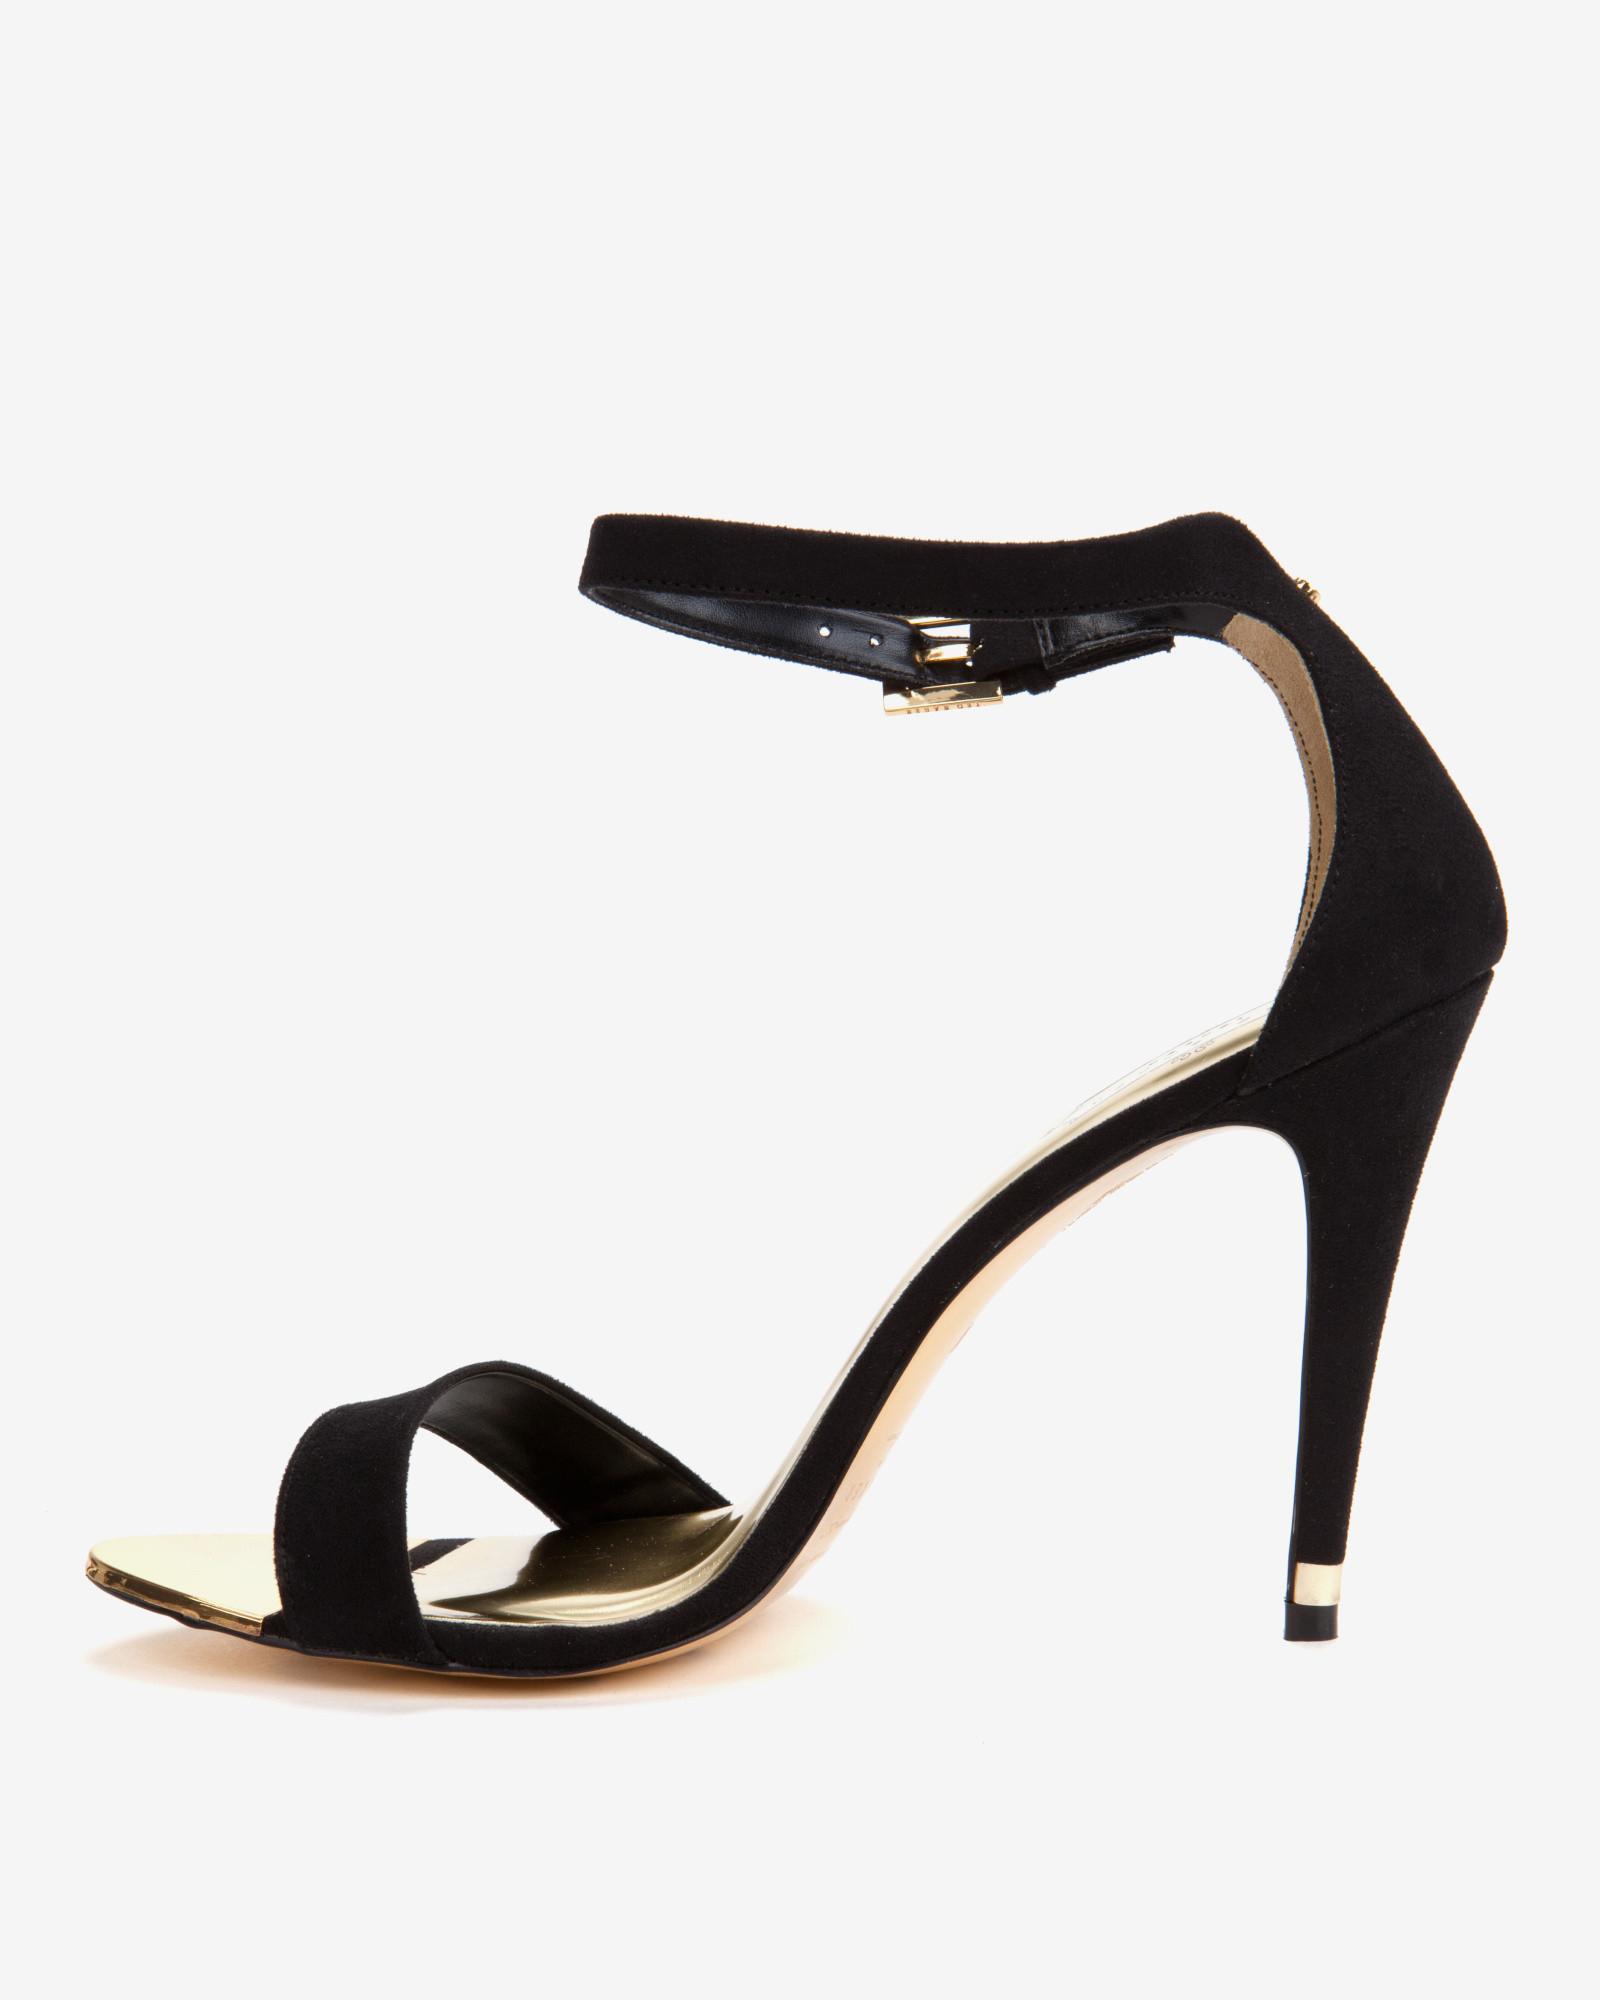 Ted Baker Ankle Strap Sandals in Black - Lyst